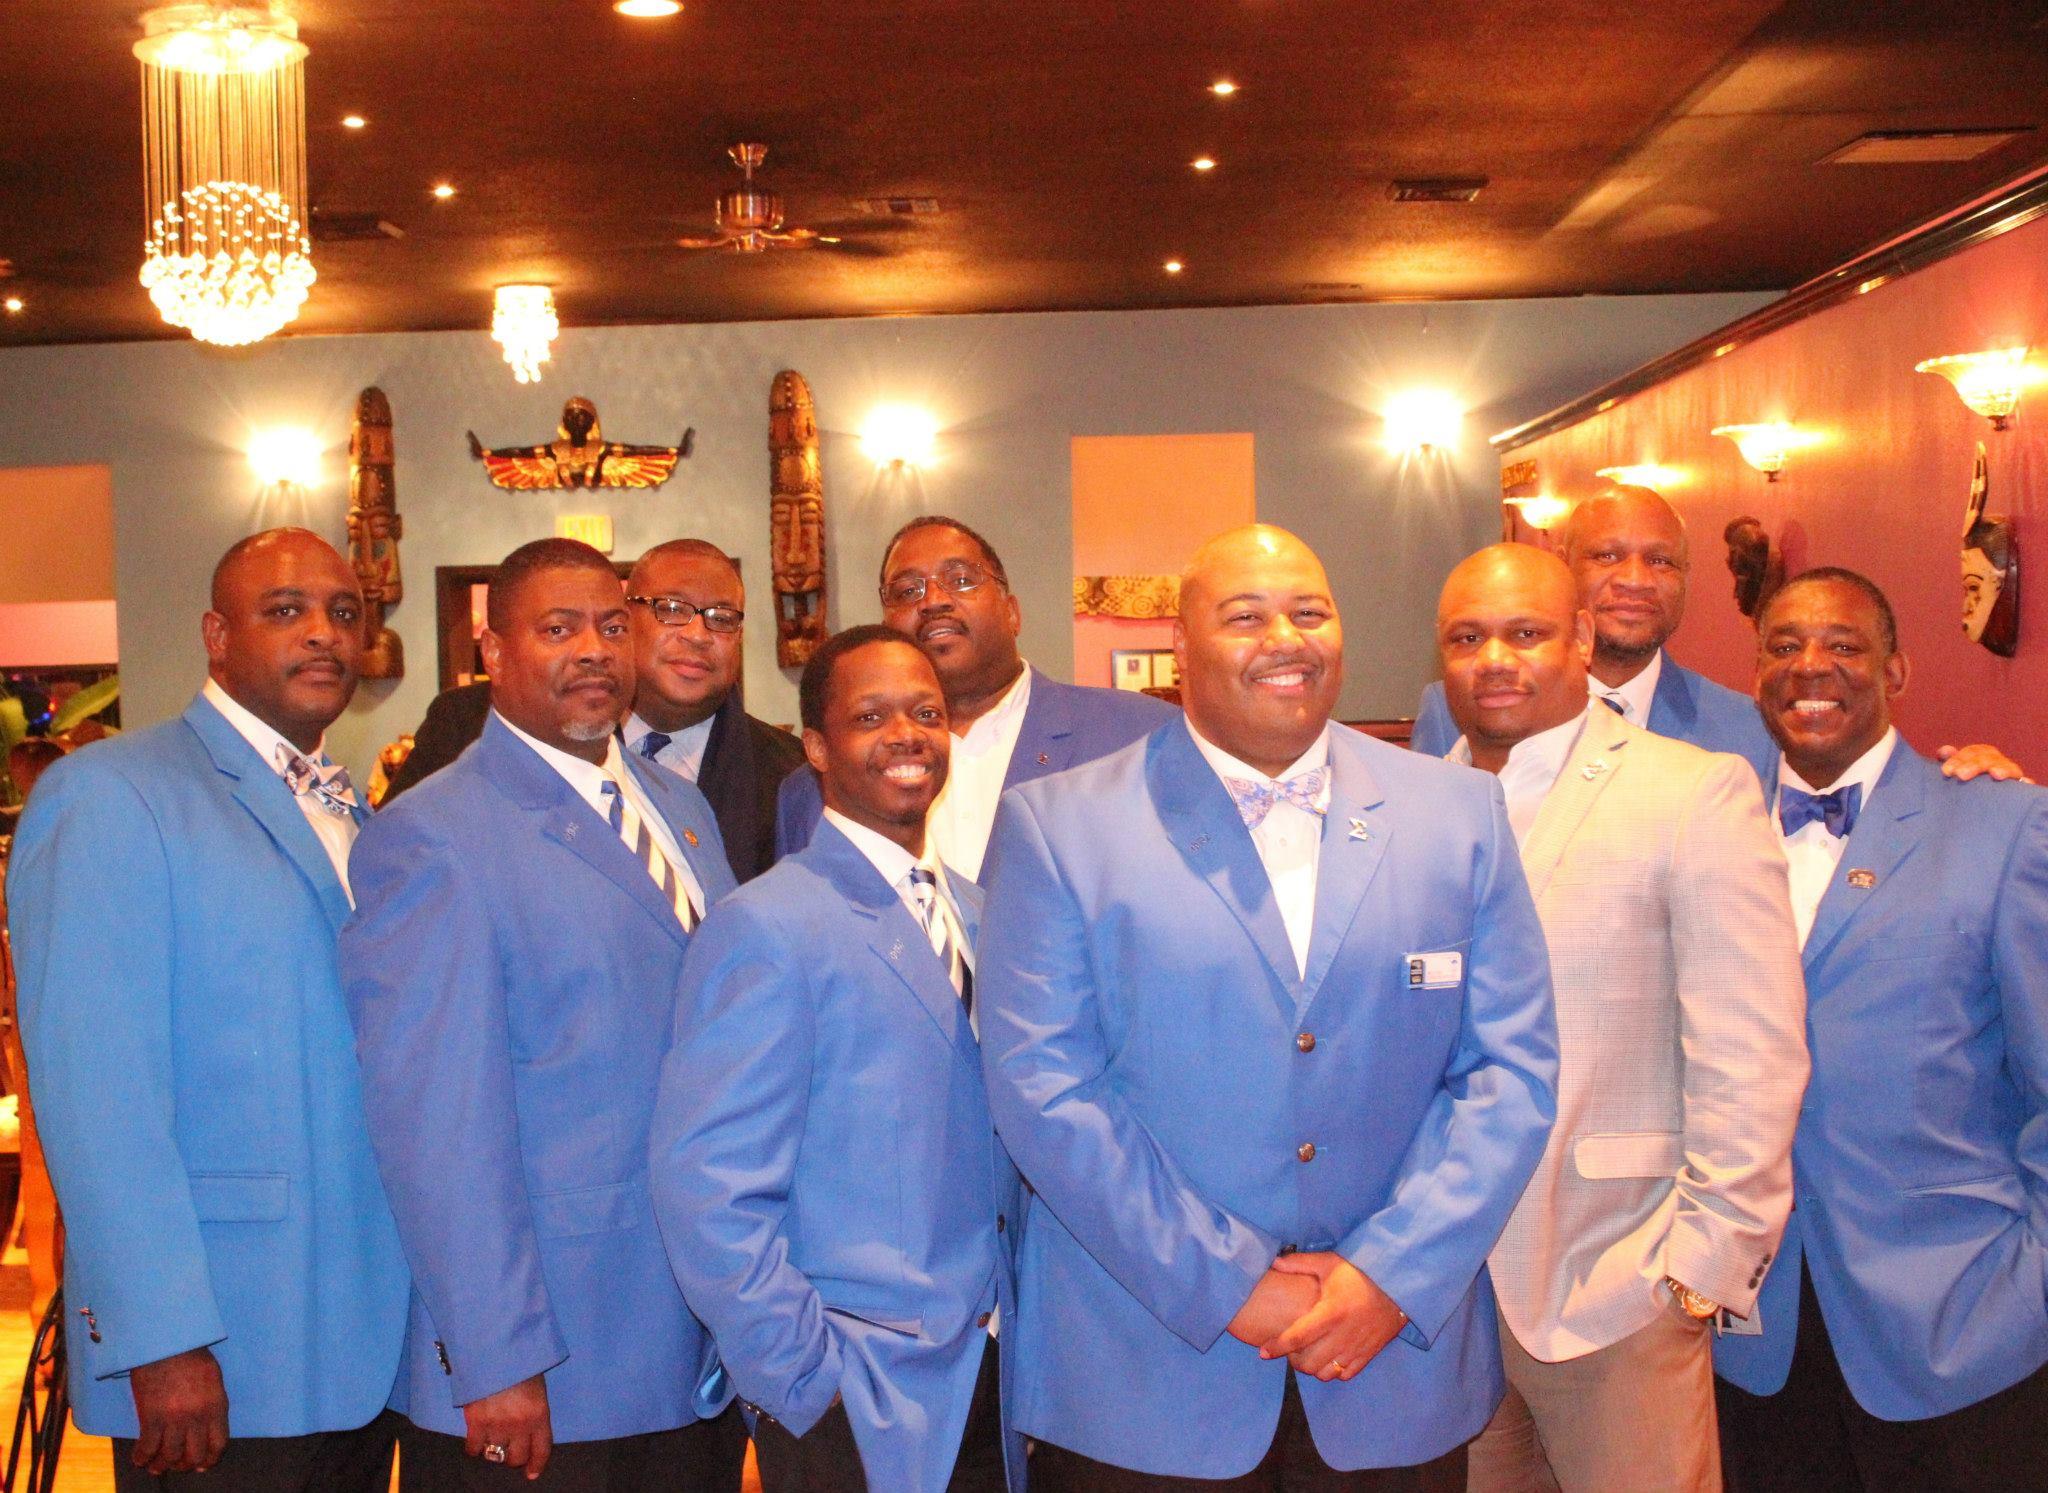 Sigmas in Blue